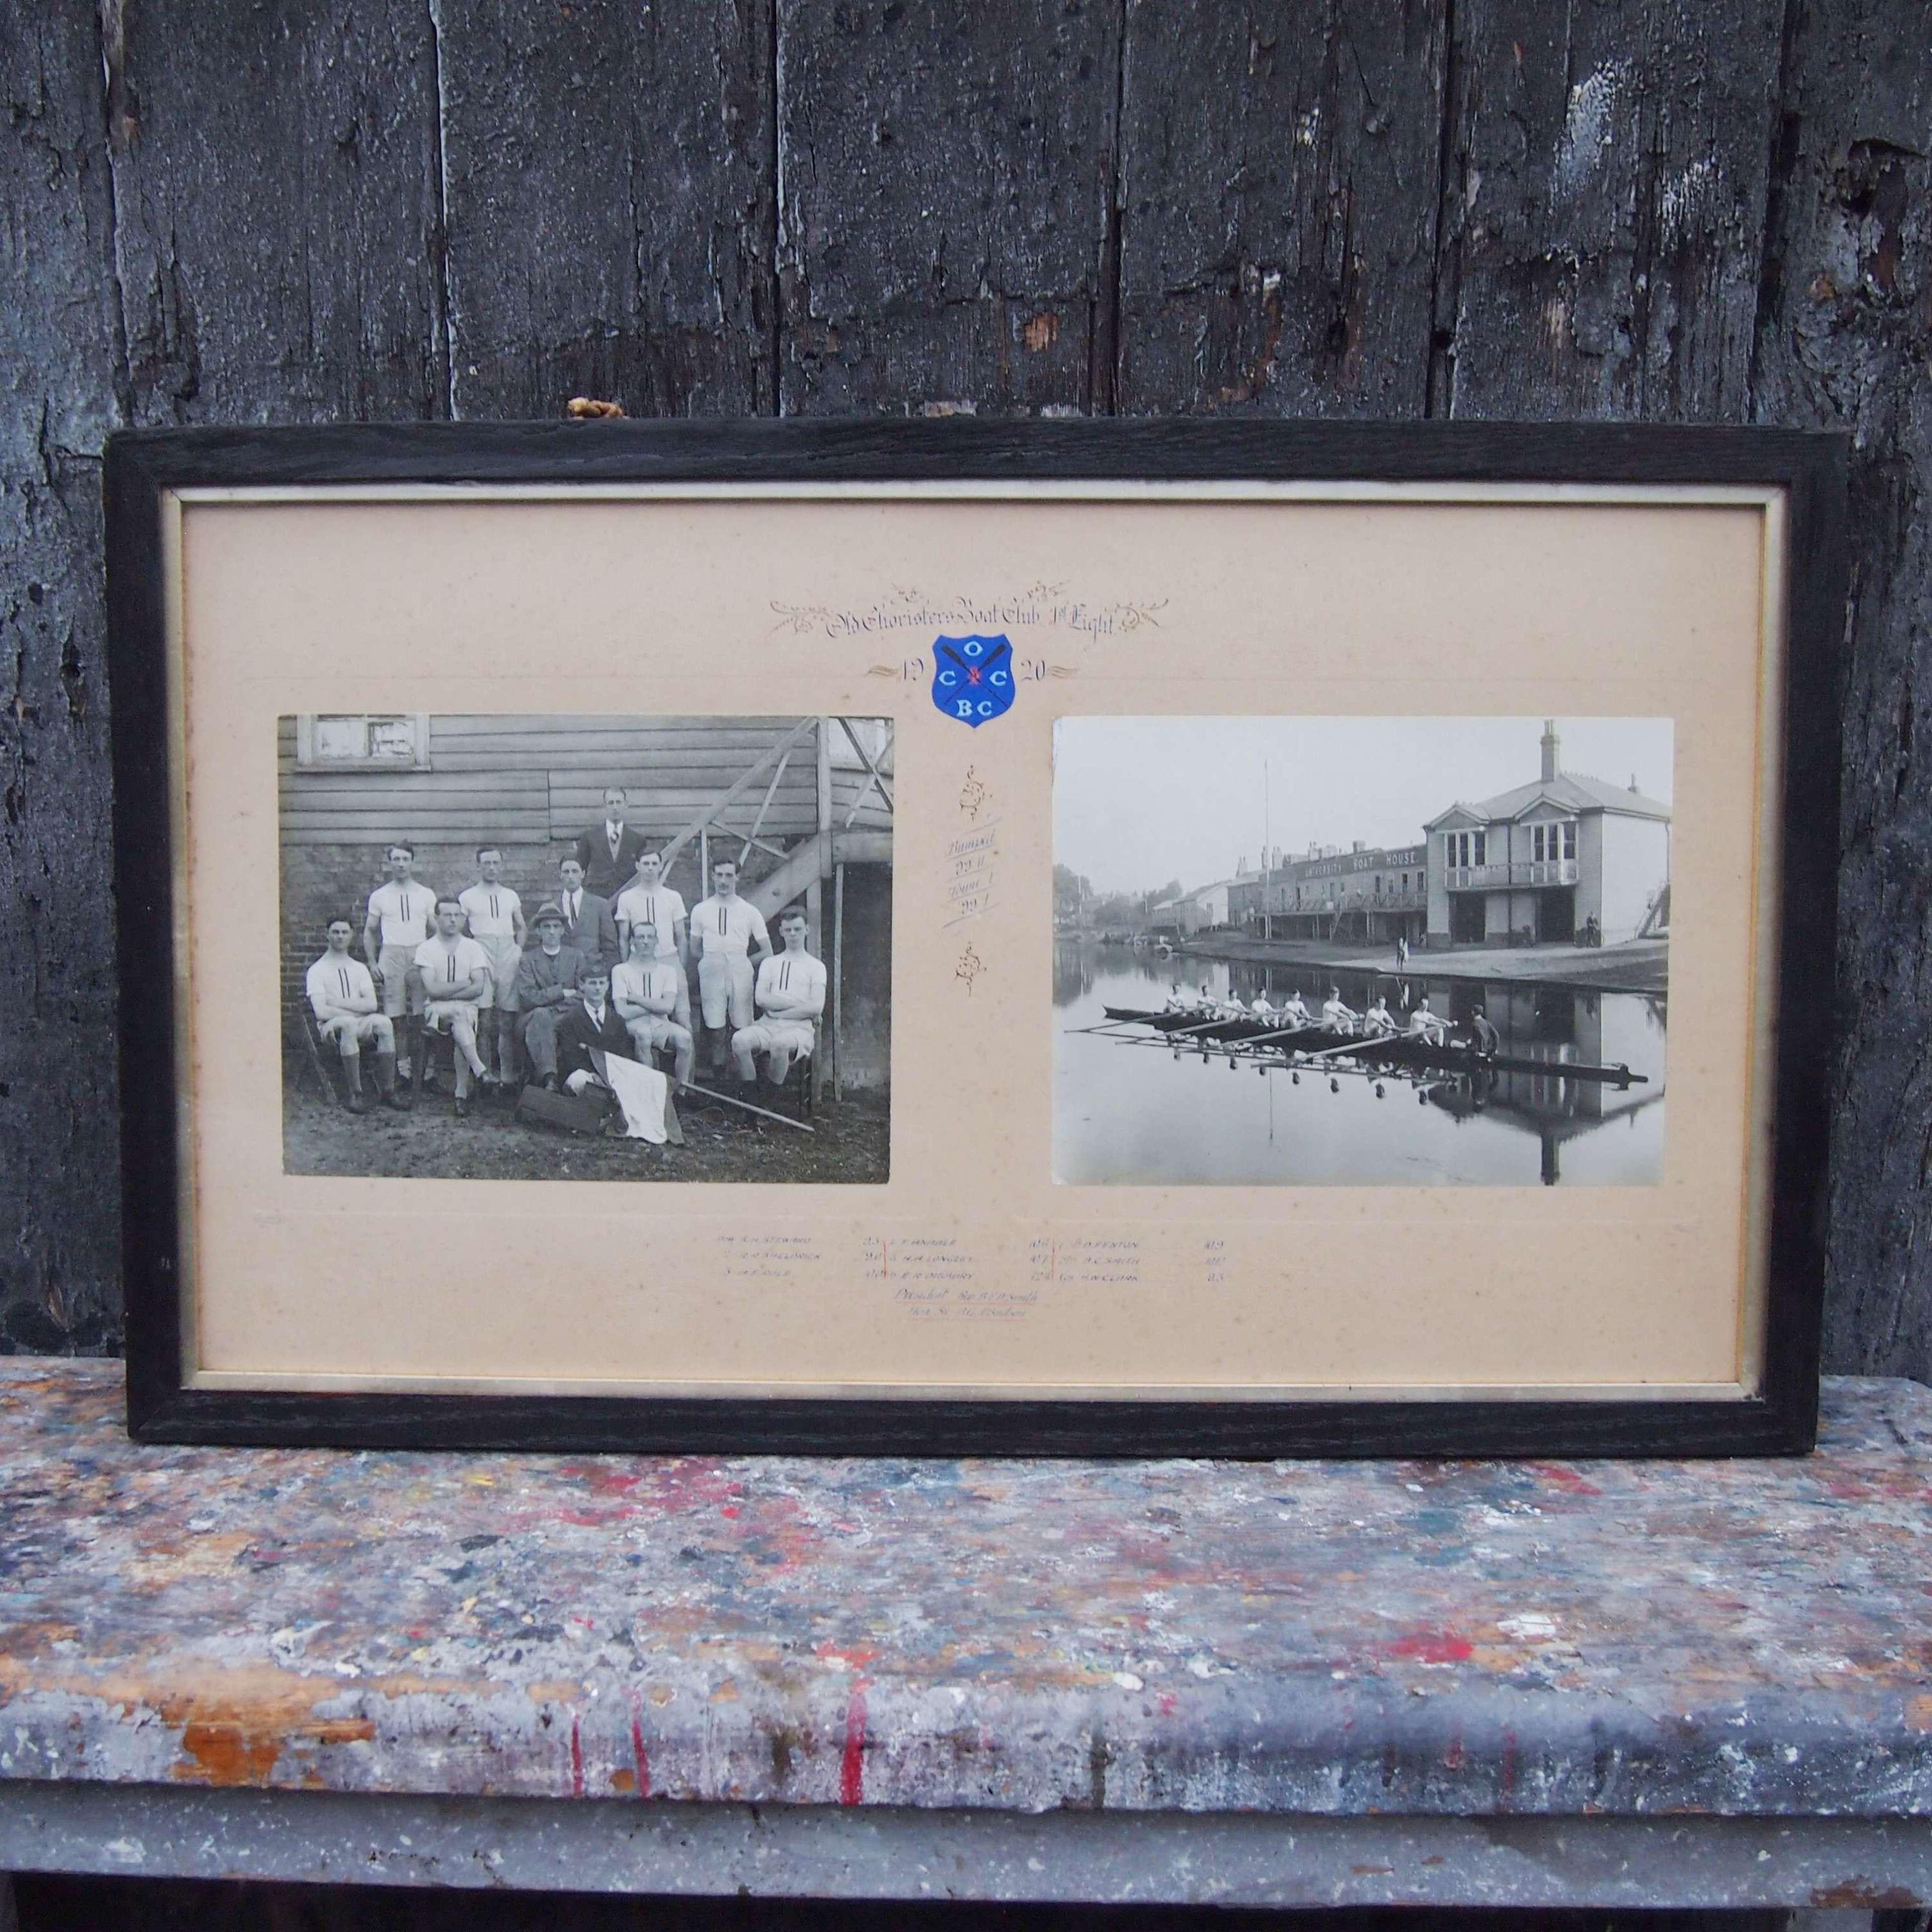 Antique Cambridge University Framed Rowing Photograph.W8620